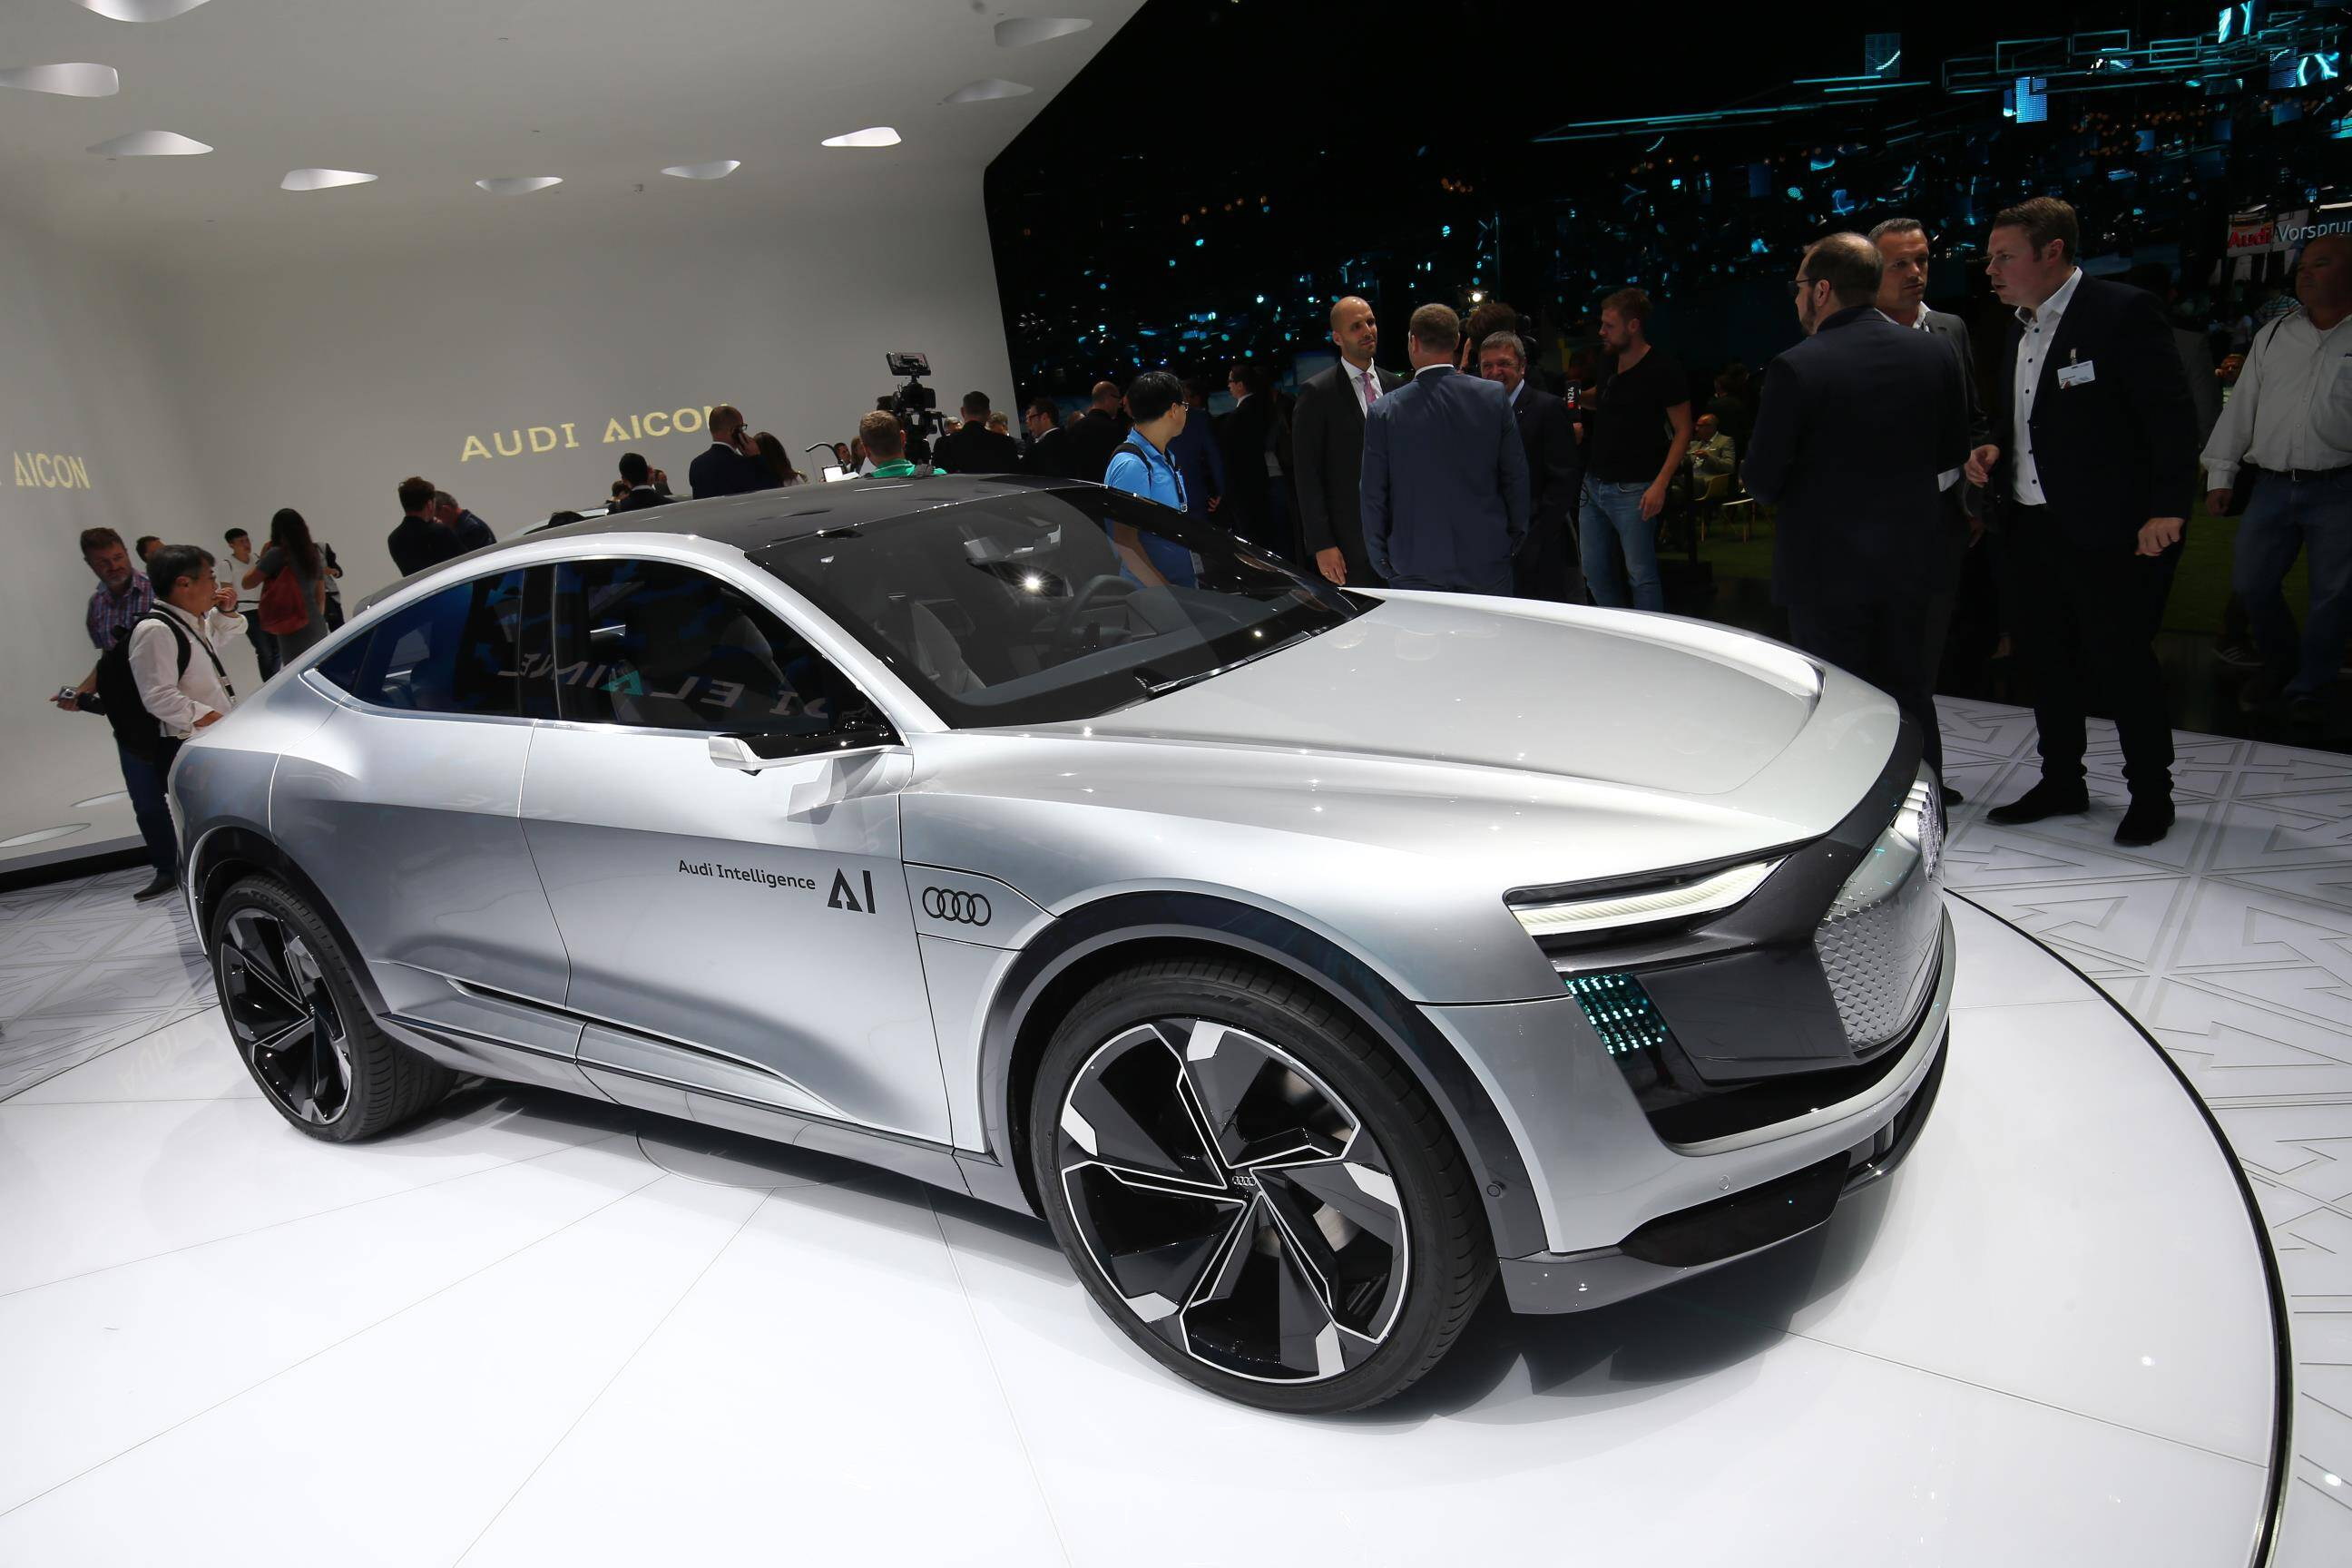 Audi Aicon. Foto: Newspress